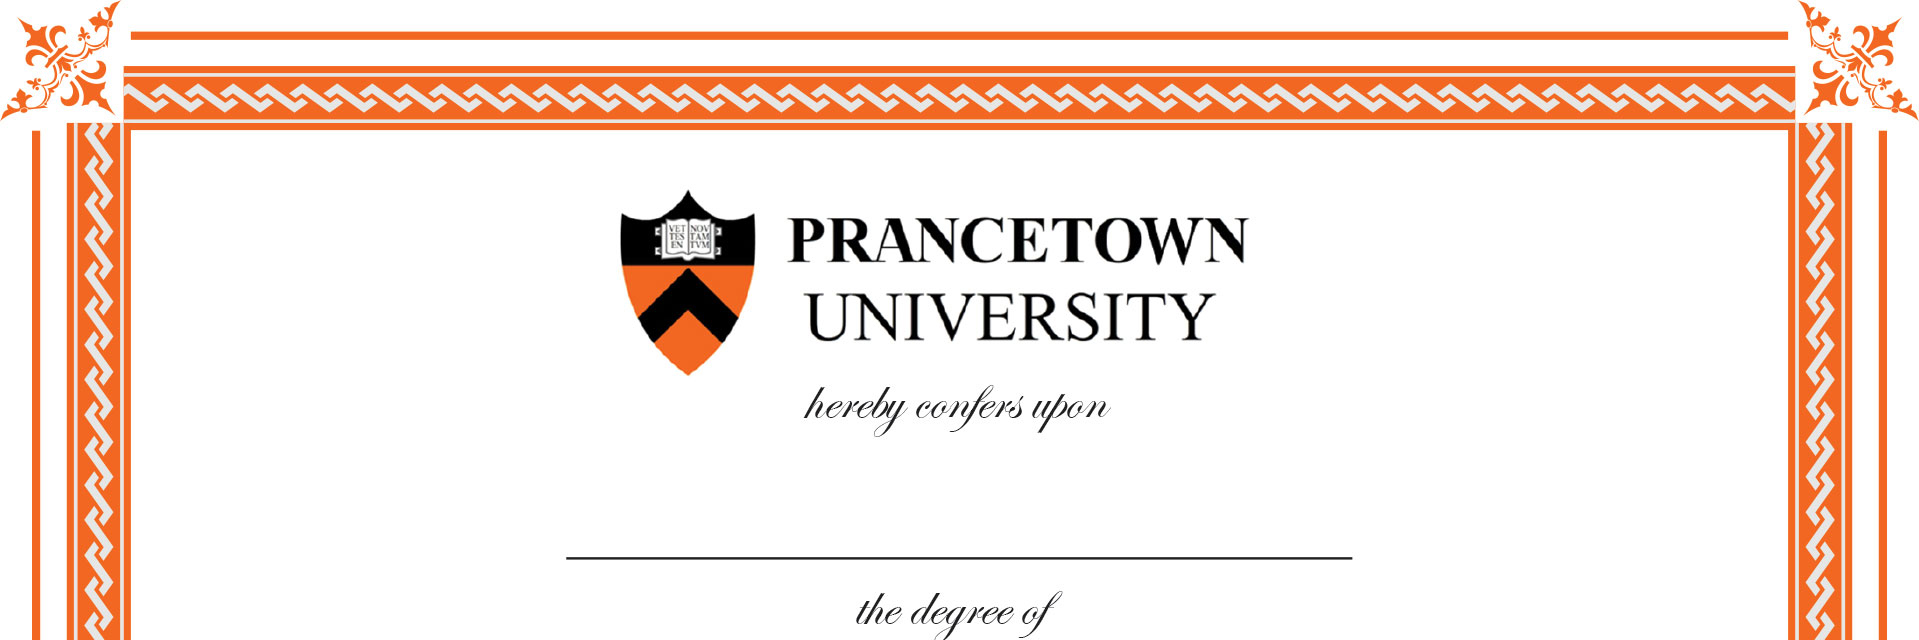 Phd programs online